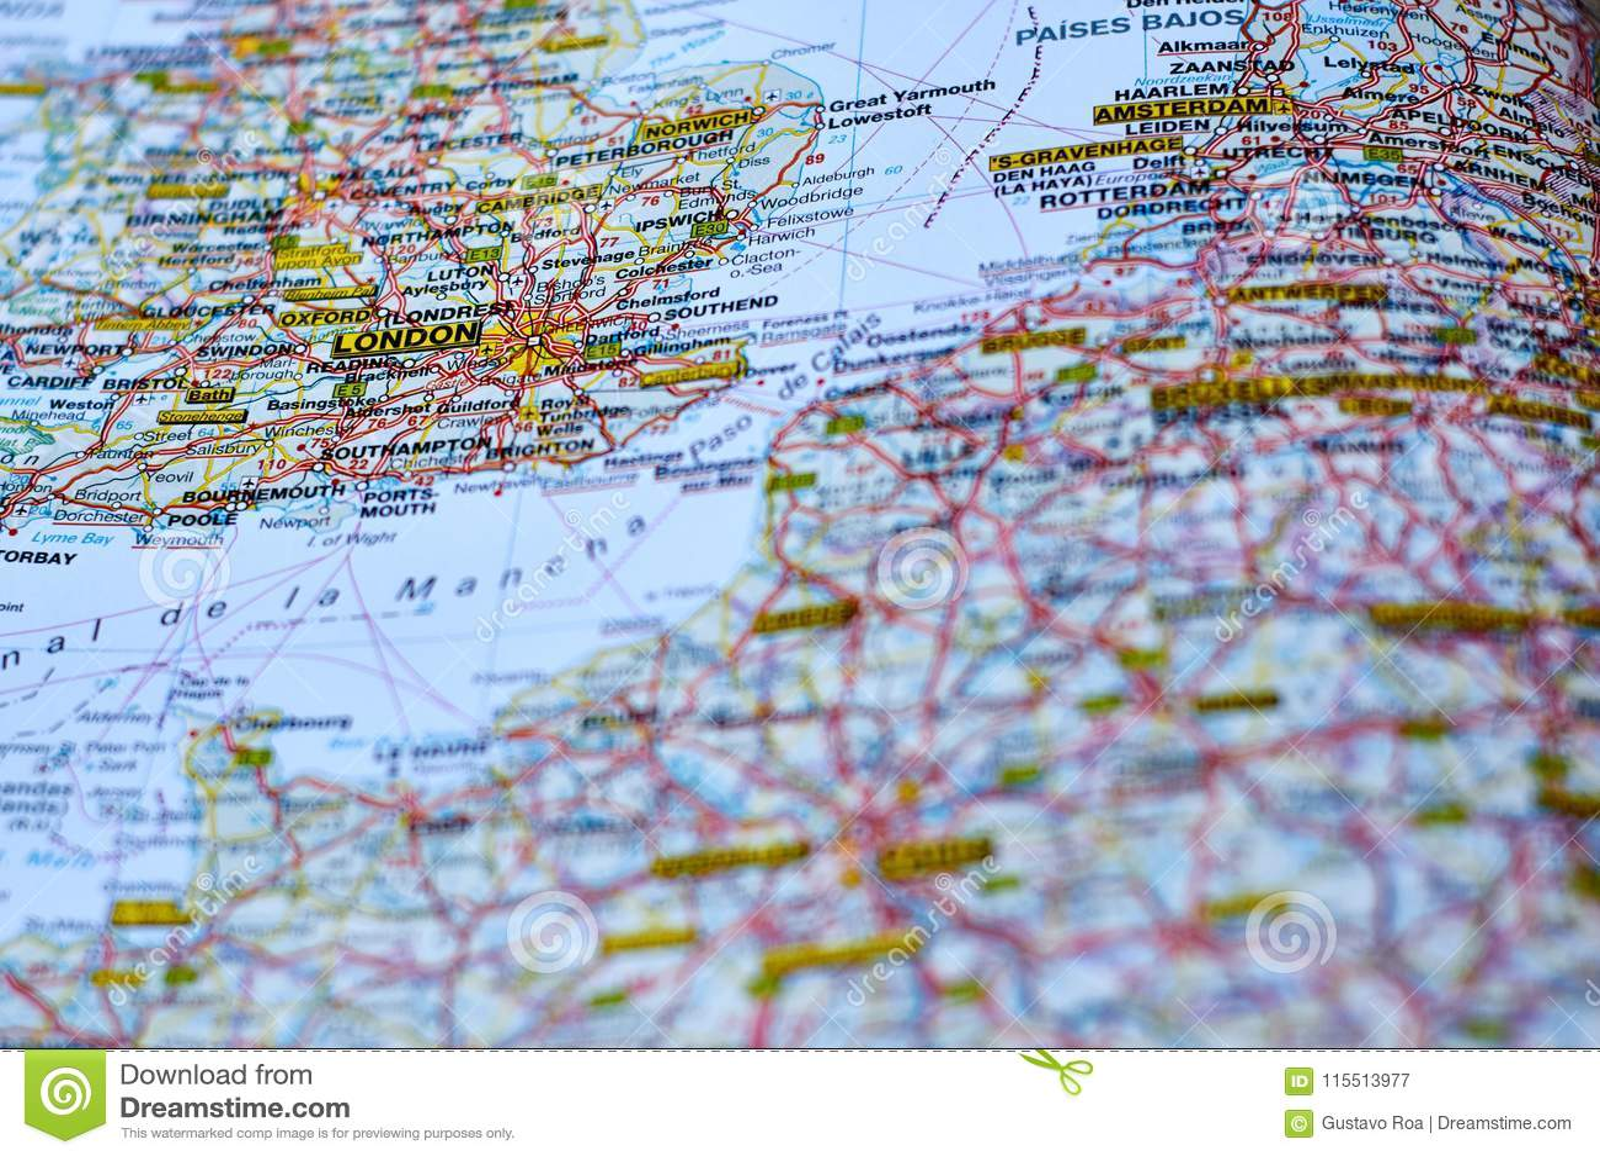 Map Of London Stock Image Image Of Europe Tour Travel 115513977